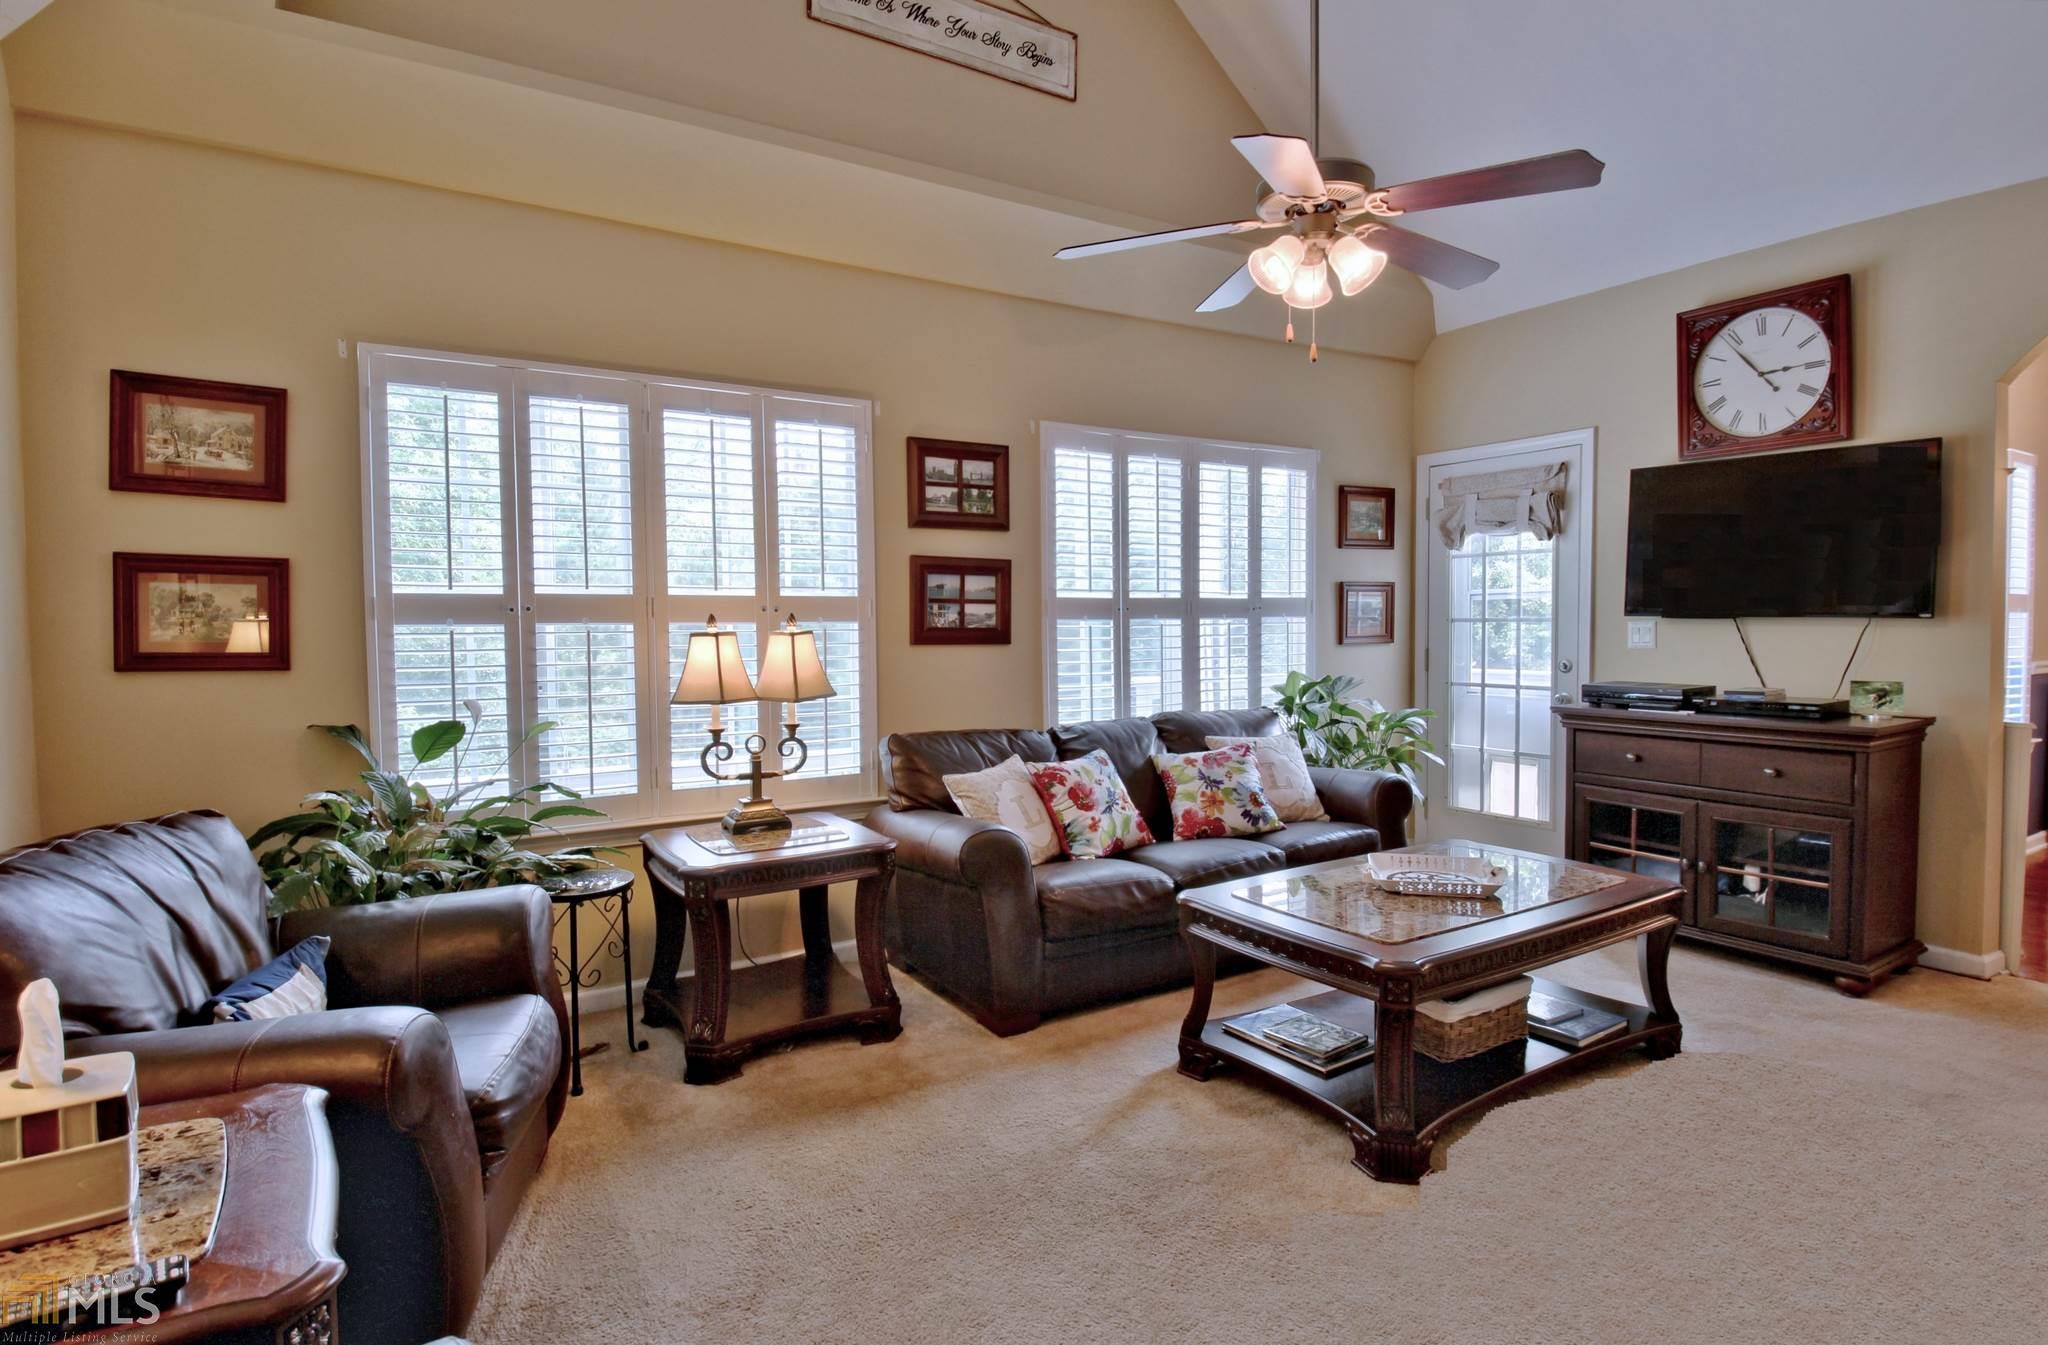 Listing: 81 Garden View Ter, Newnan, GA.| MLS# 8397389 | Malinda ...